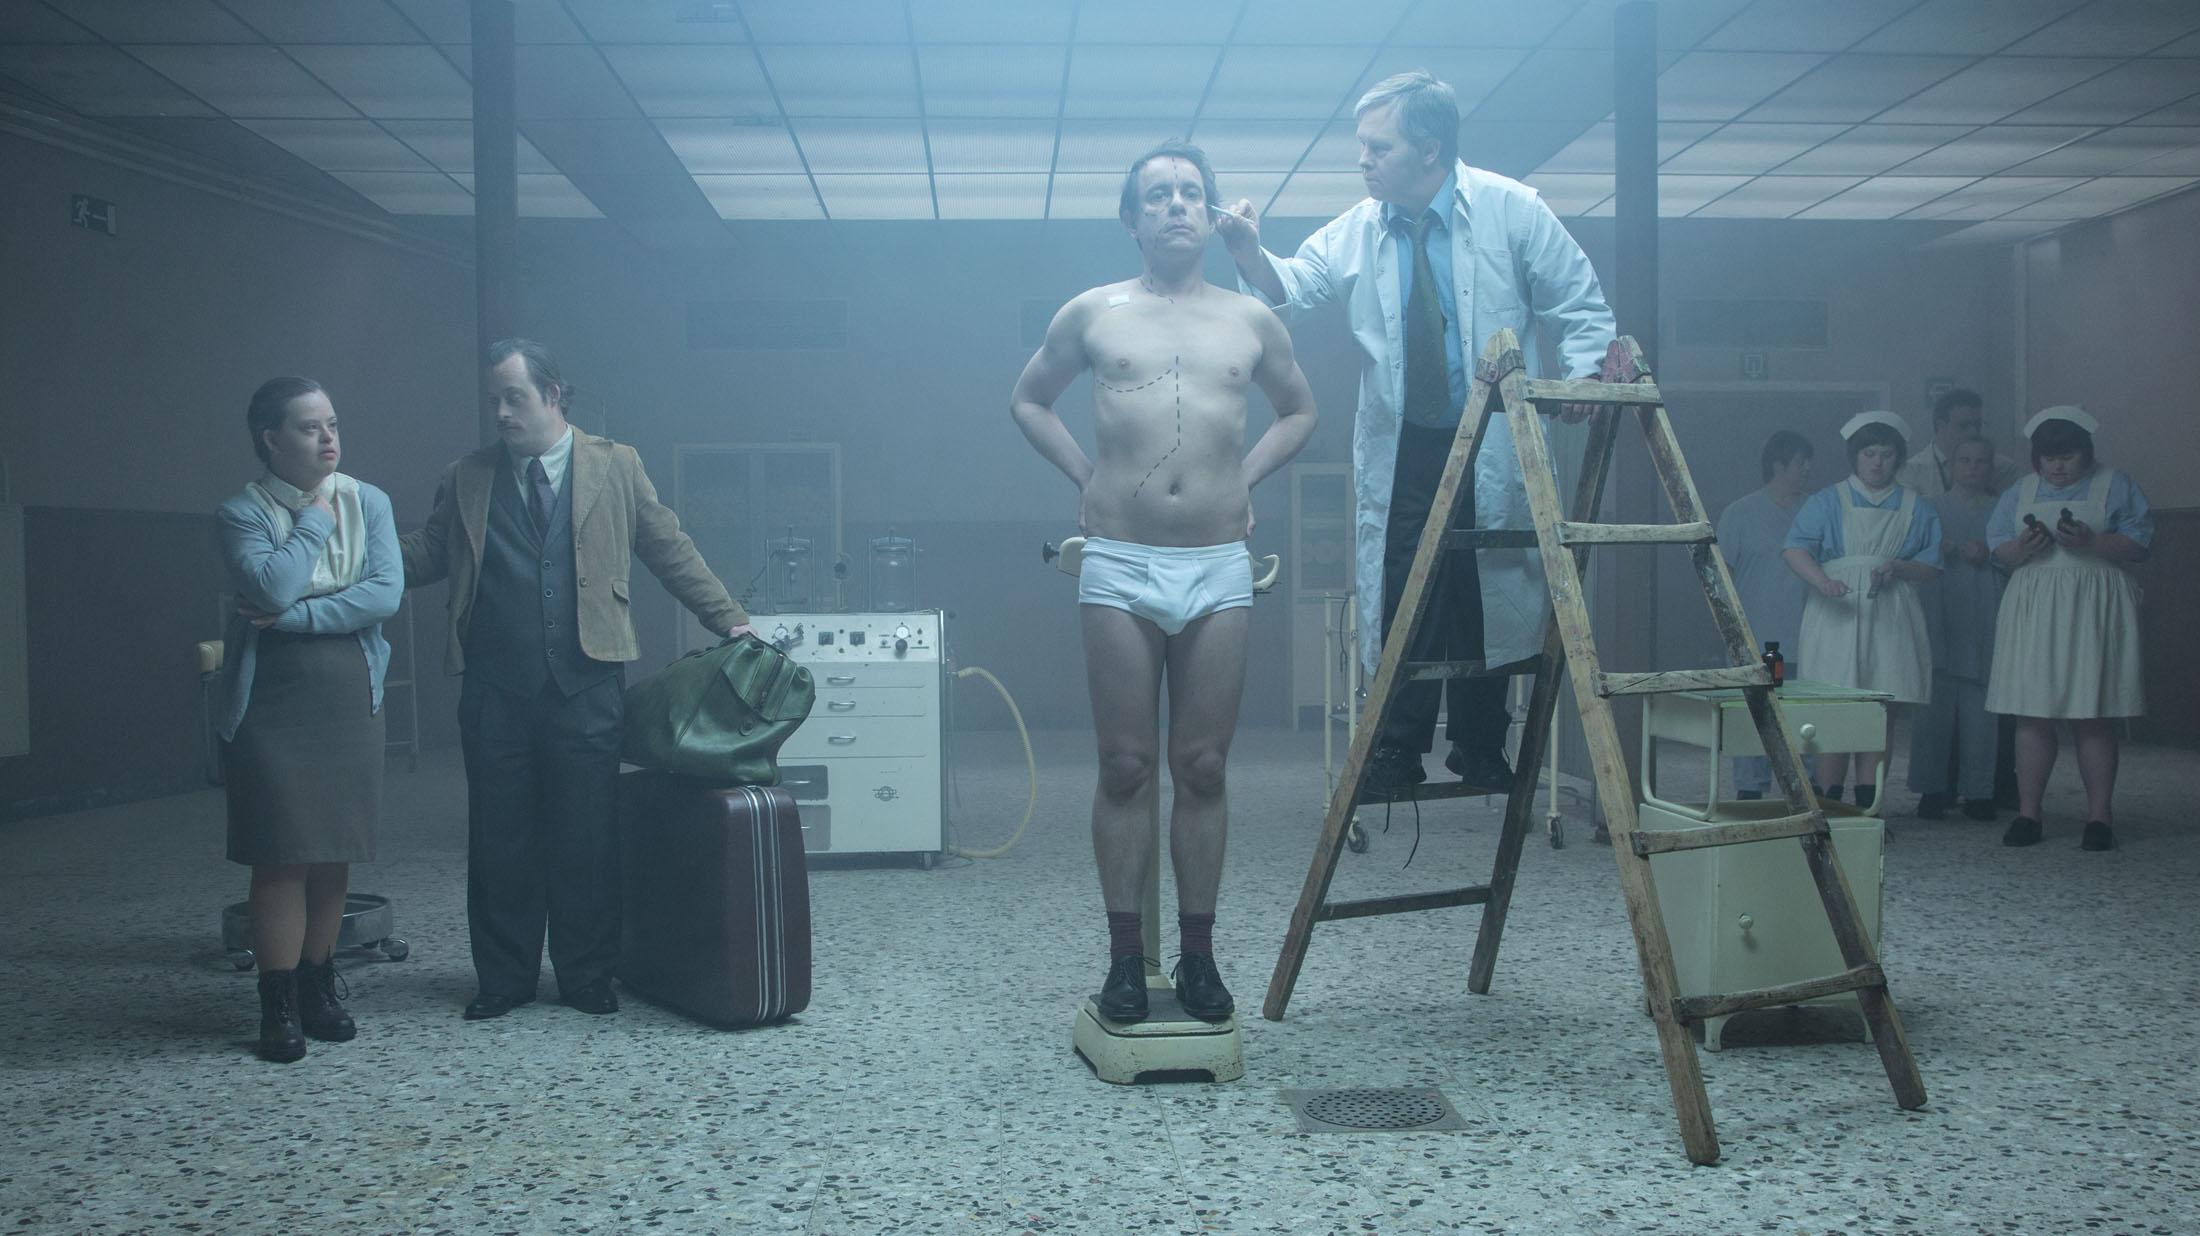 Nico Sturm, Tineke Van Haute & Peter Janssens in DOWNSIDE UP directed by Peter Ghesquiere - DoP Robrecht Heyvaert - Courtesy A-TEAM PRODCUTIONS